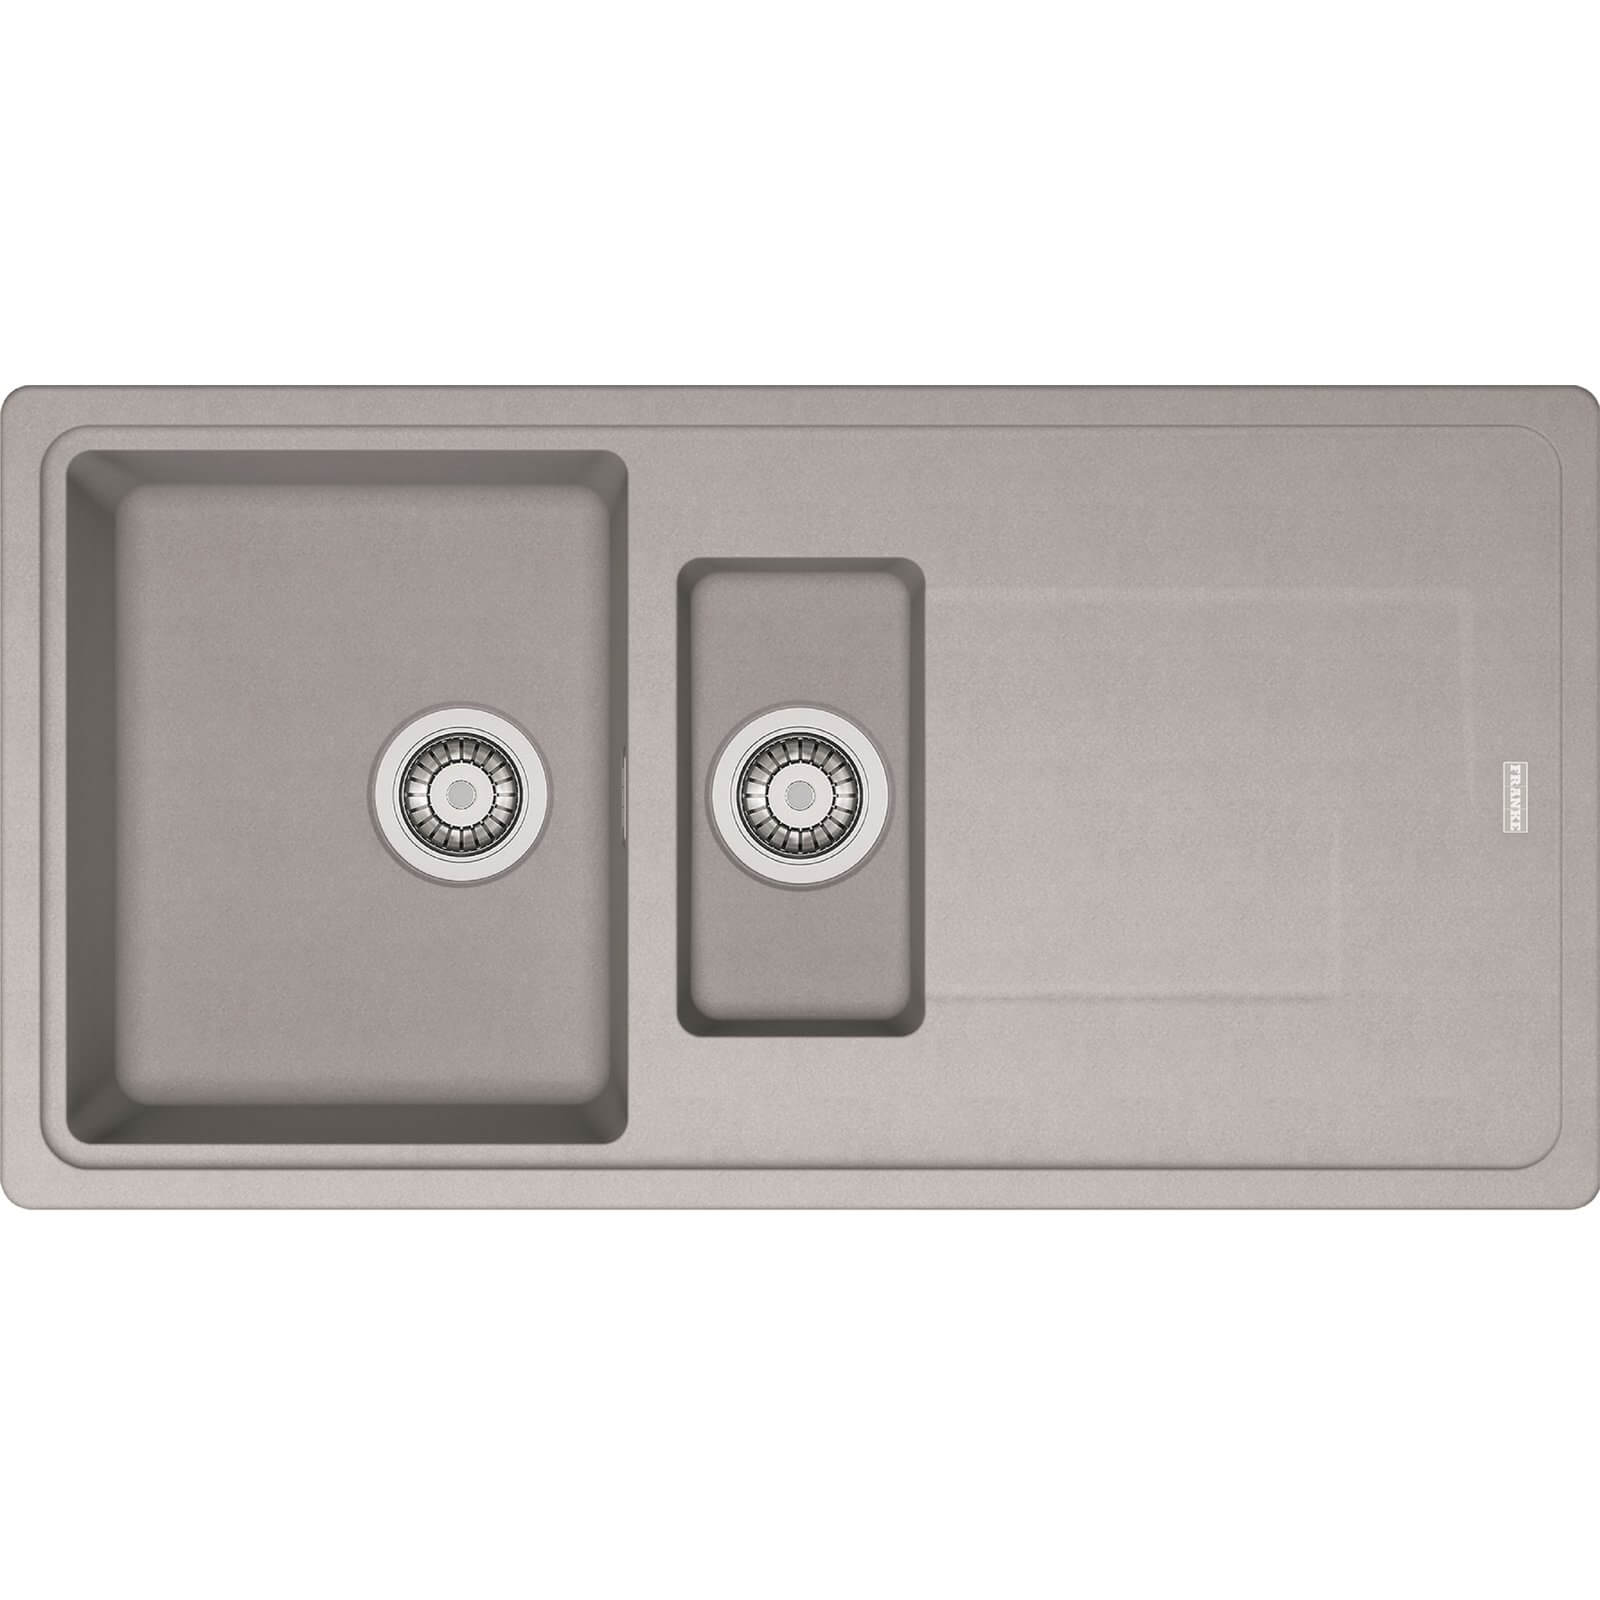 Franke Gemini Grey Reversible Kitchen Sink - 1.5 Bowl